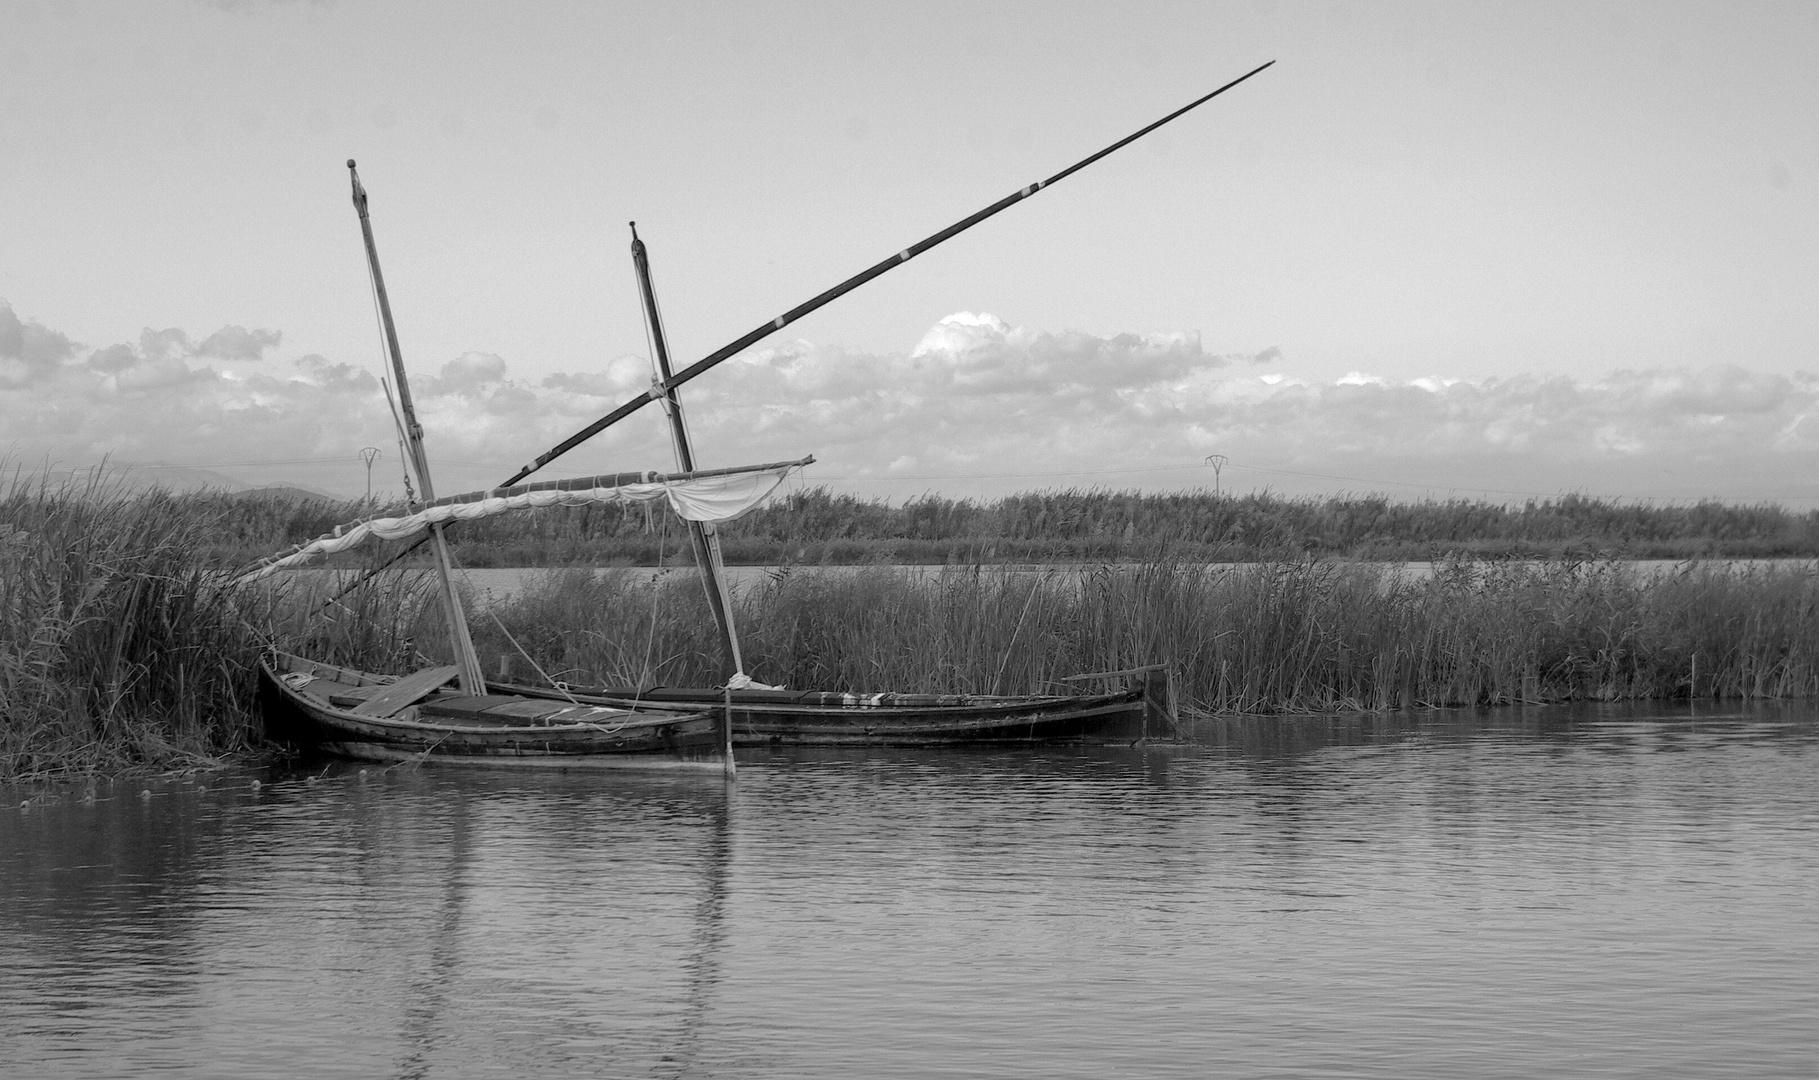 Barcas de l,Albufera